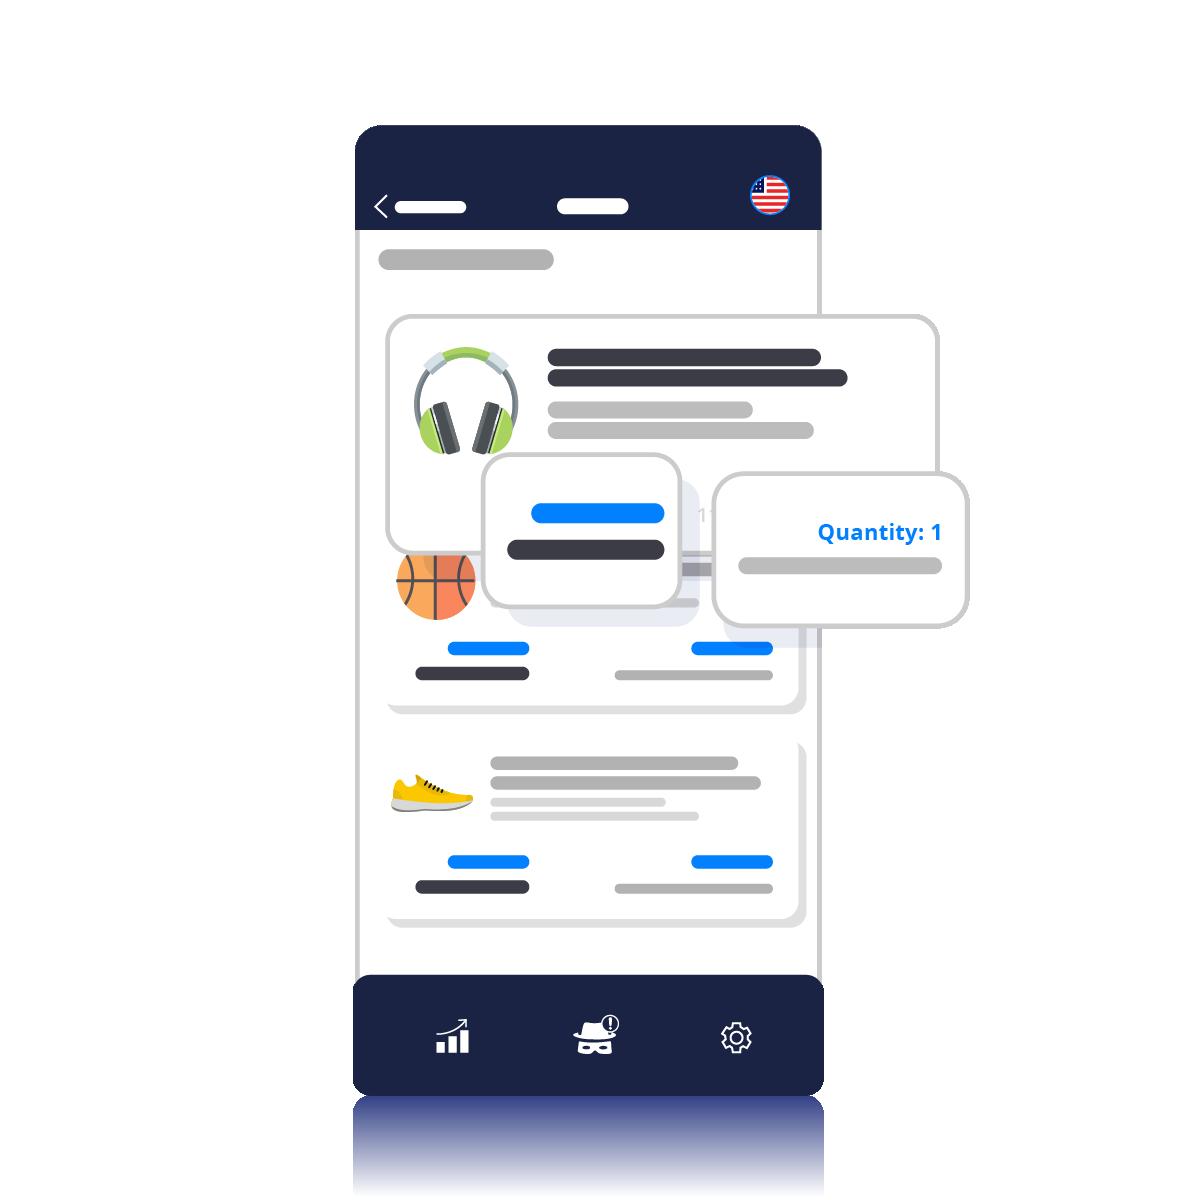 https://www.helium10.com/app/uploads/2020/03/Mobile-App_inst_notif_V2.png